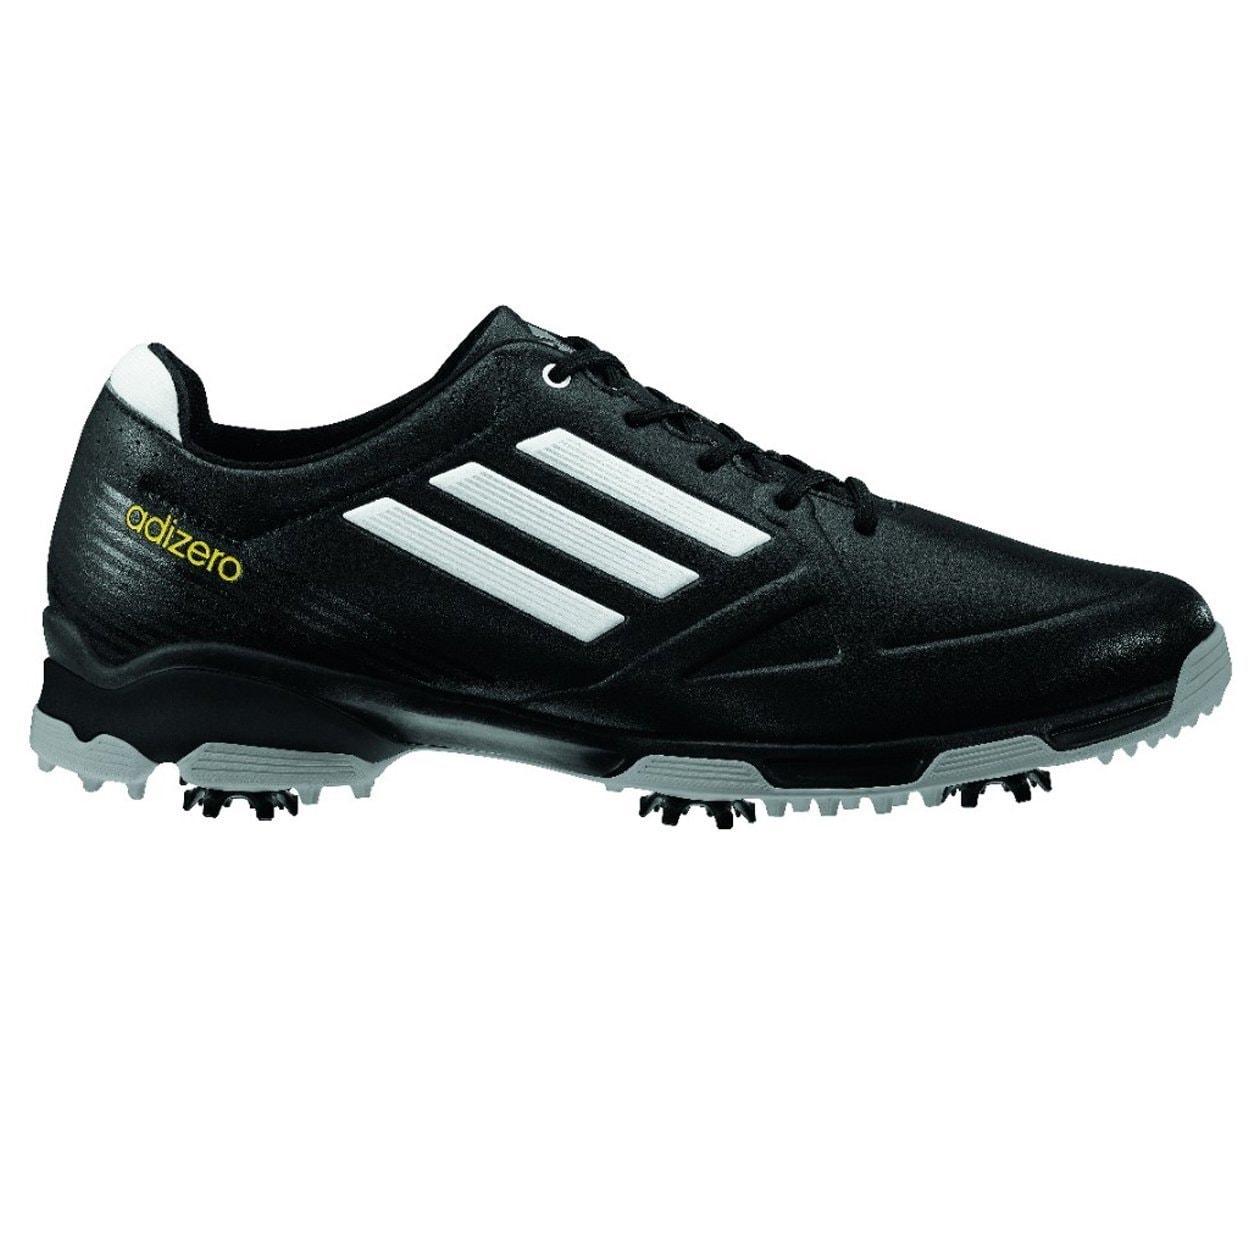 Adidas Men's Adizero 6-Spike Black/ White Golf Shoes (9 M...